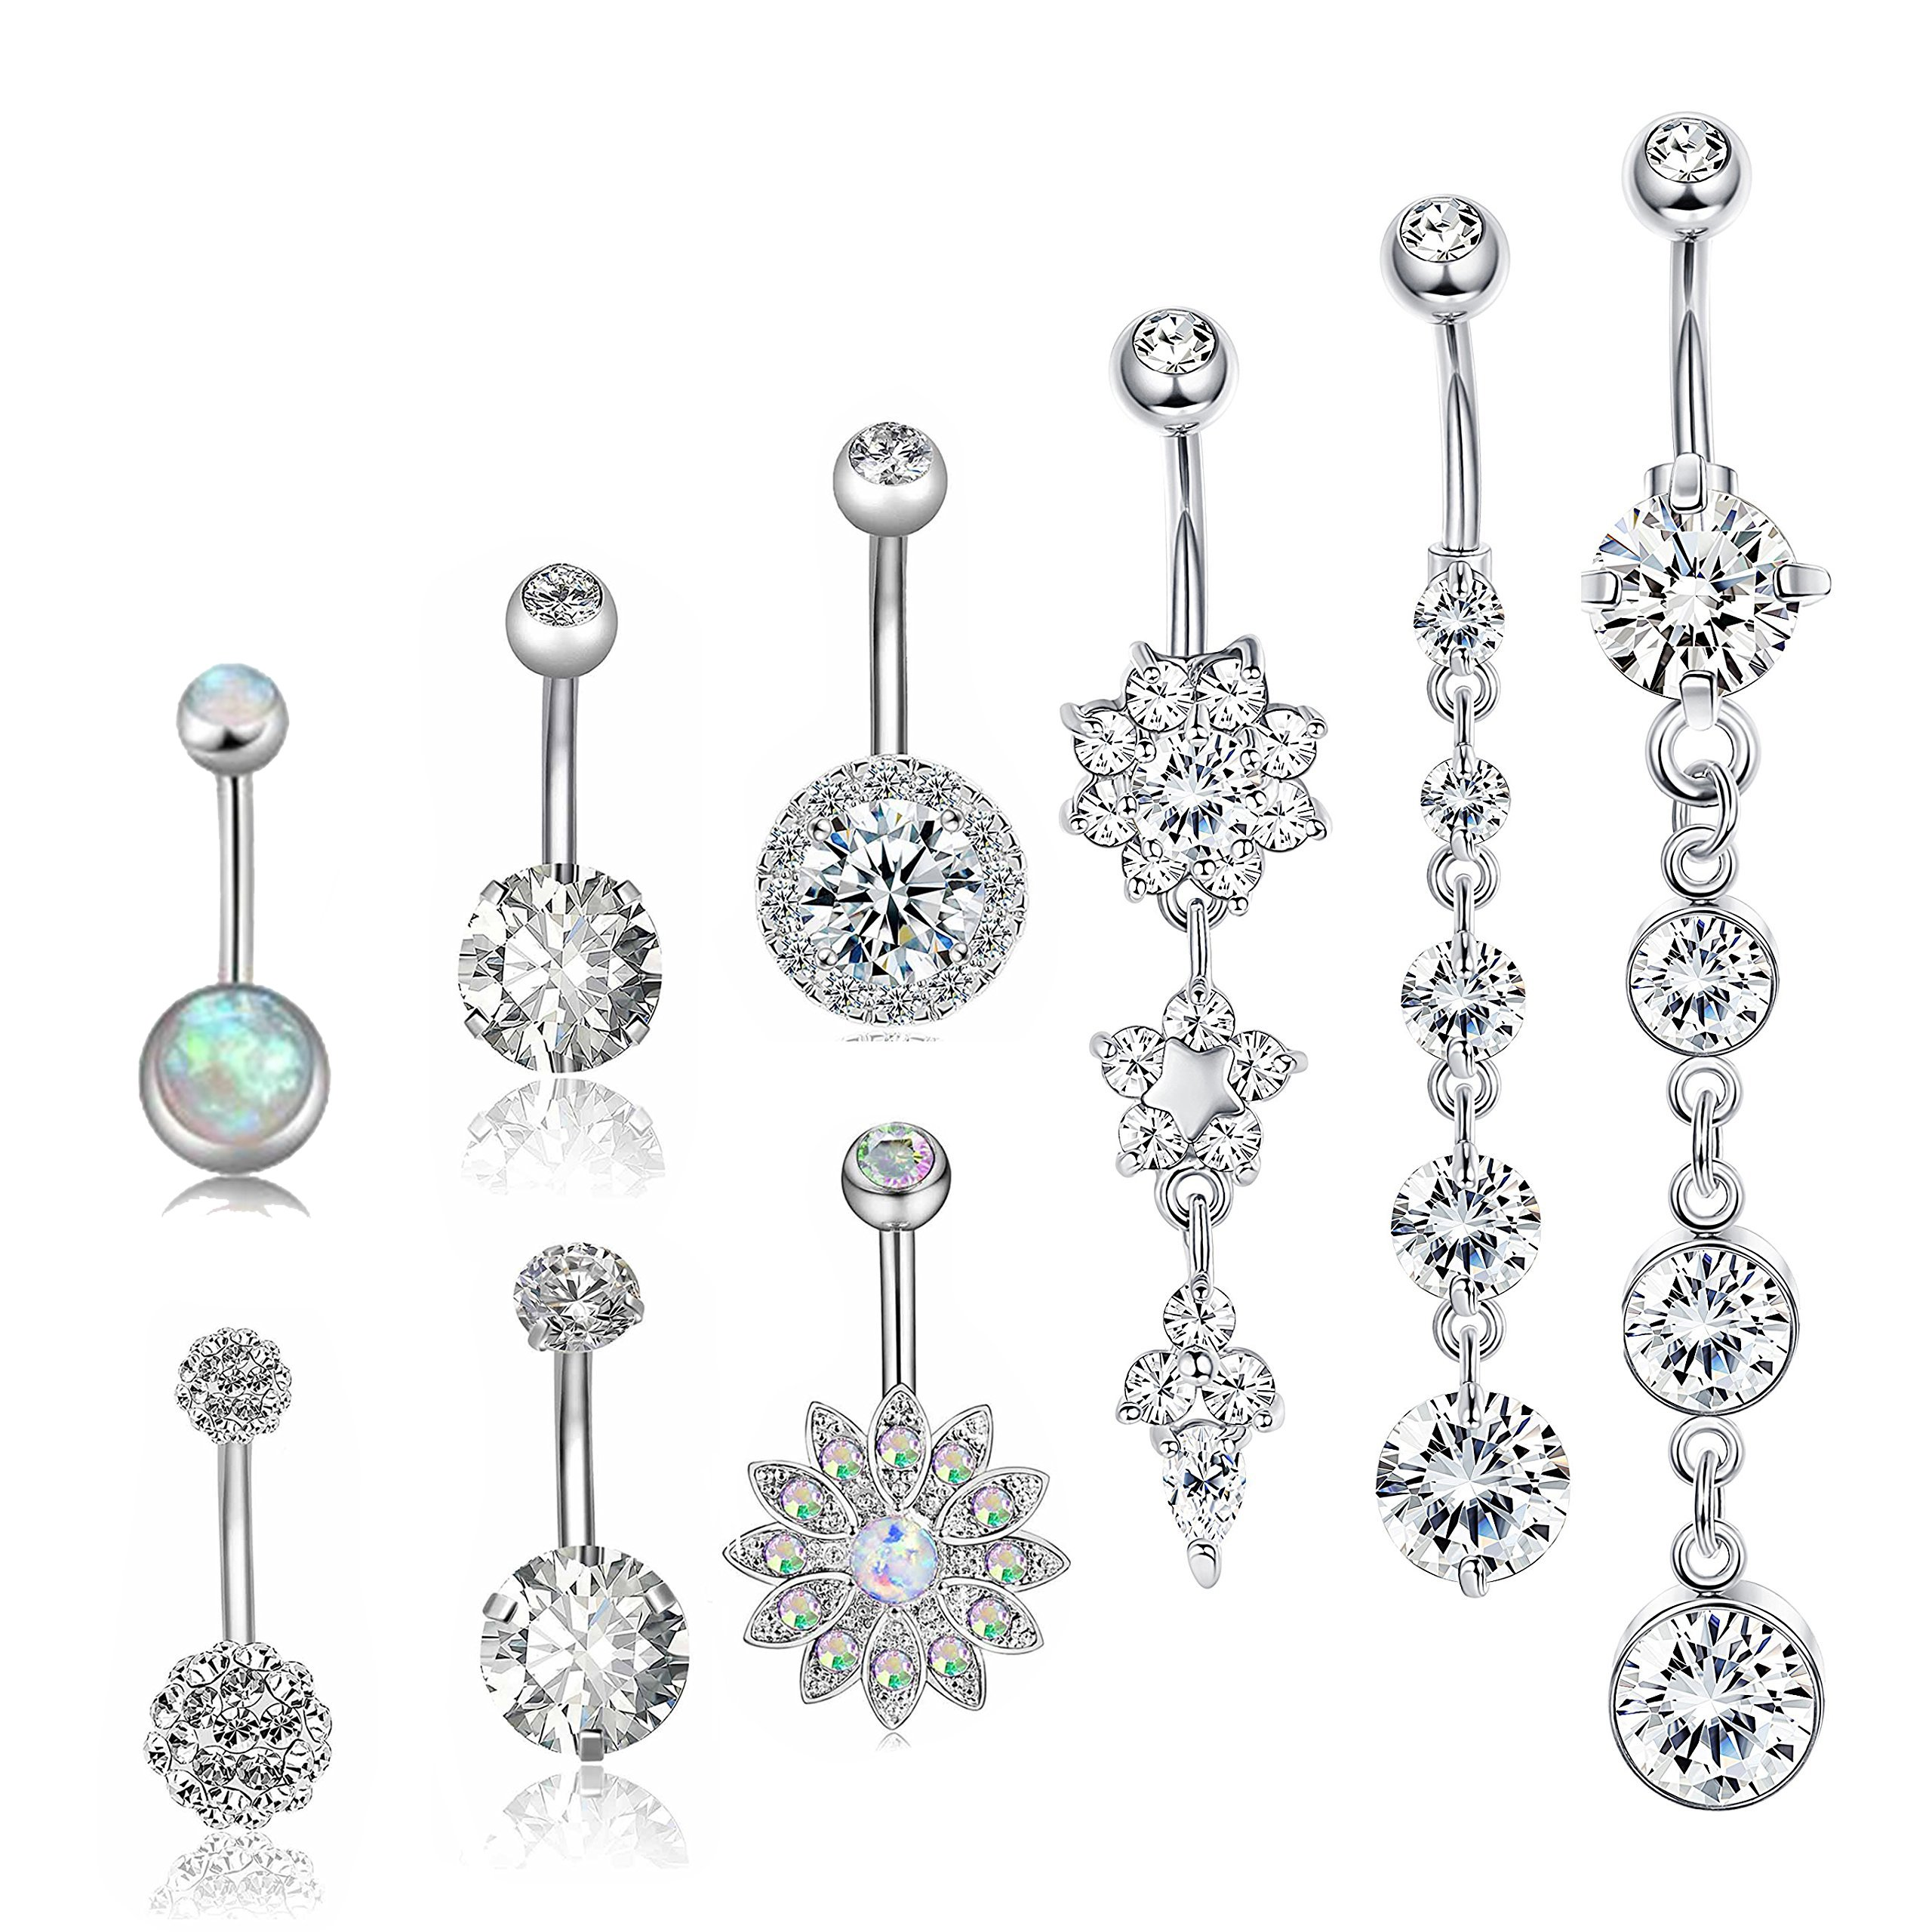 Besteel 9 Pcs 14G Stainless Steel Dangle Belly Button Rings Women Girls Navel Rings CZ Body Piercing Sliver-tone